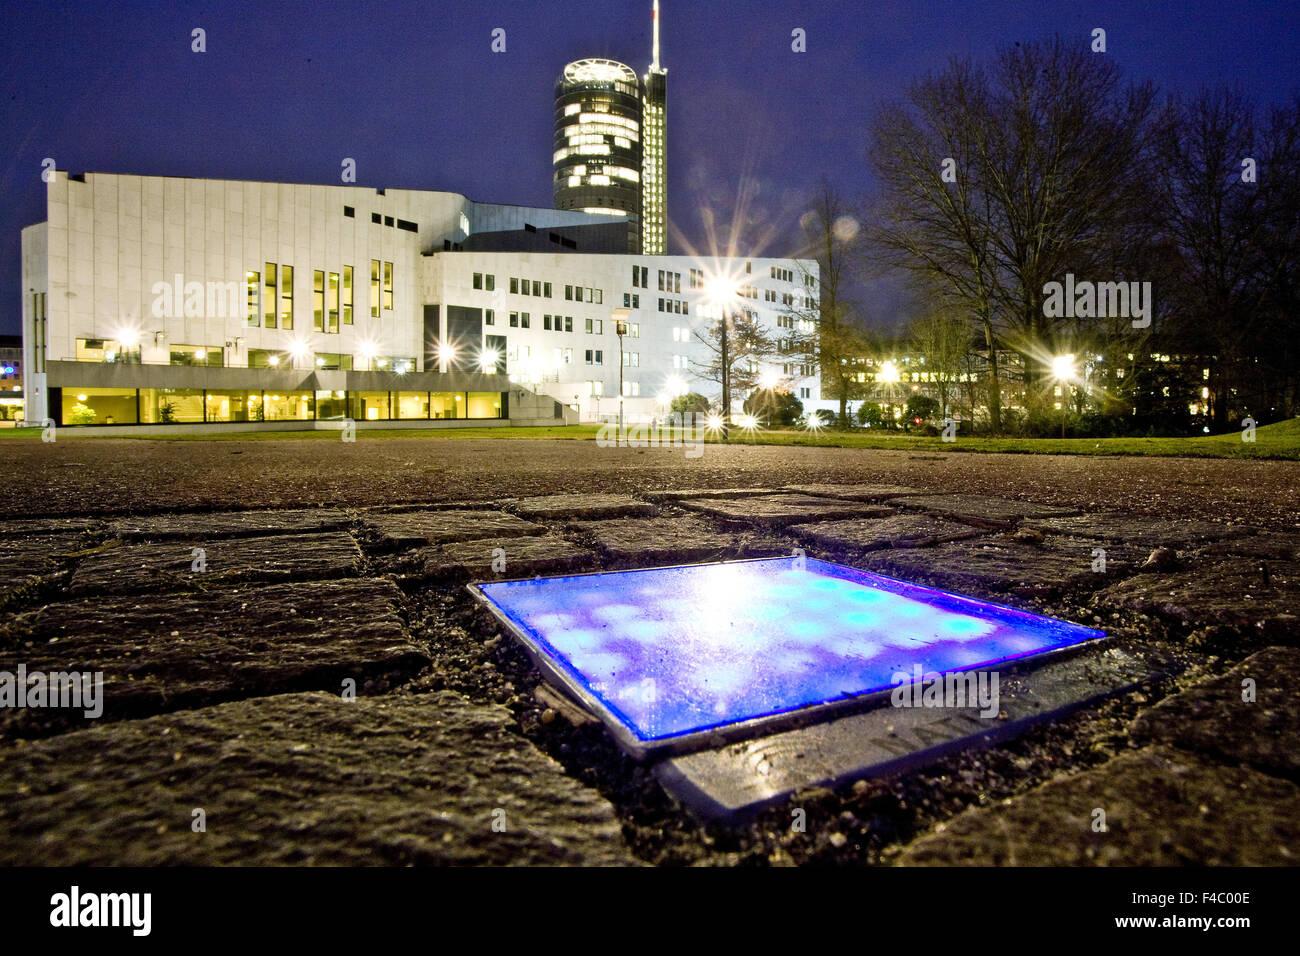 Culture path, Essen, Germany - Stock Image